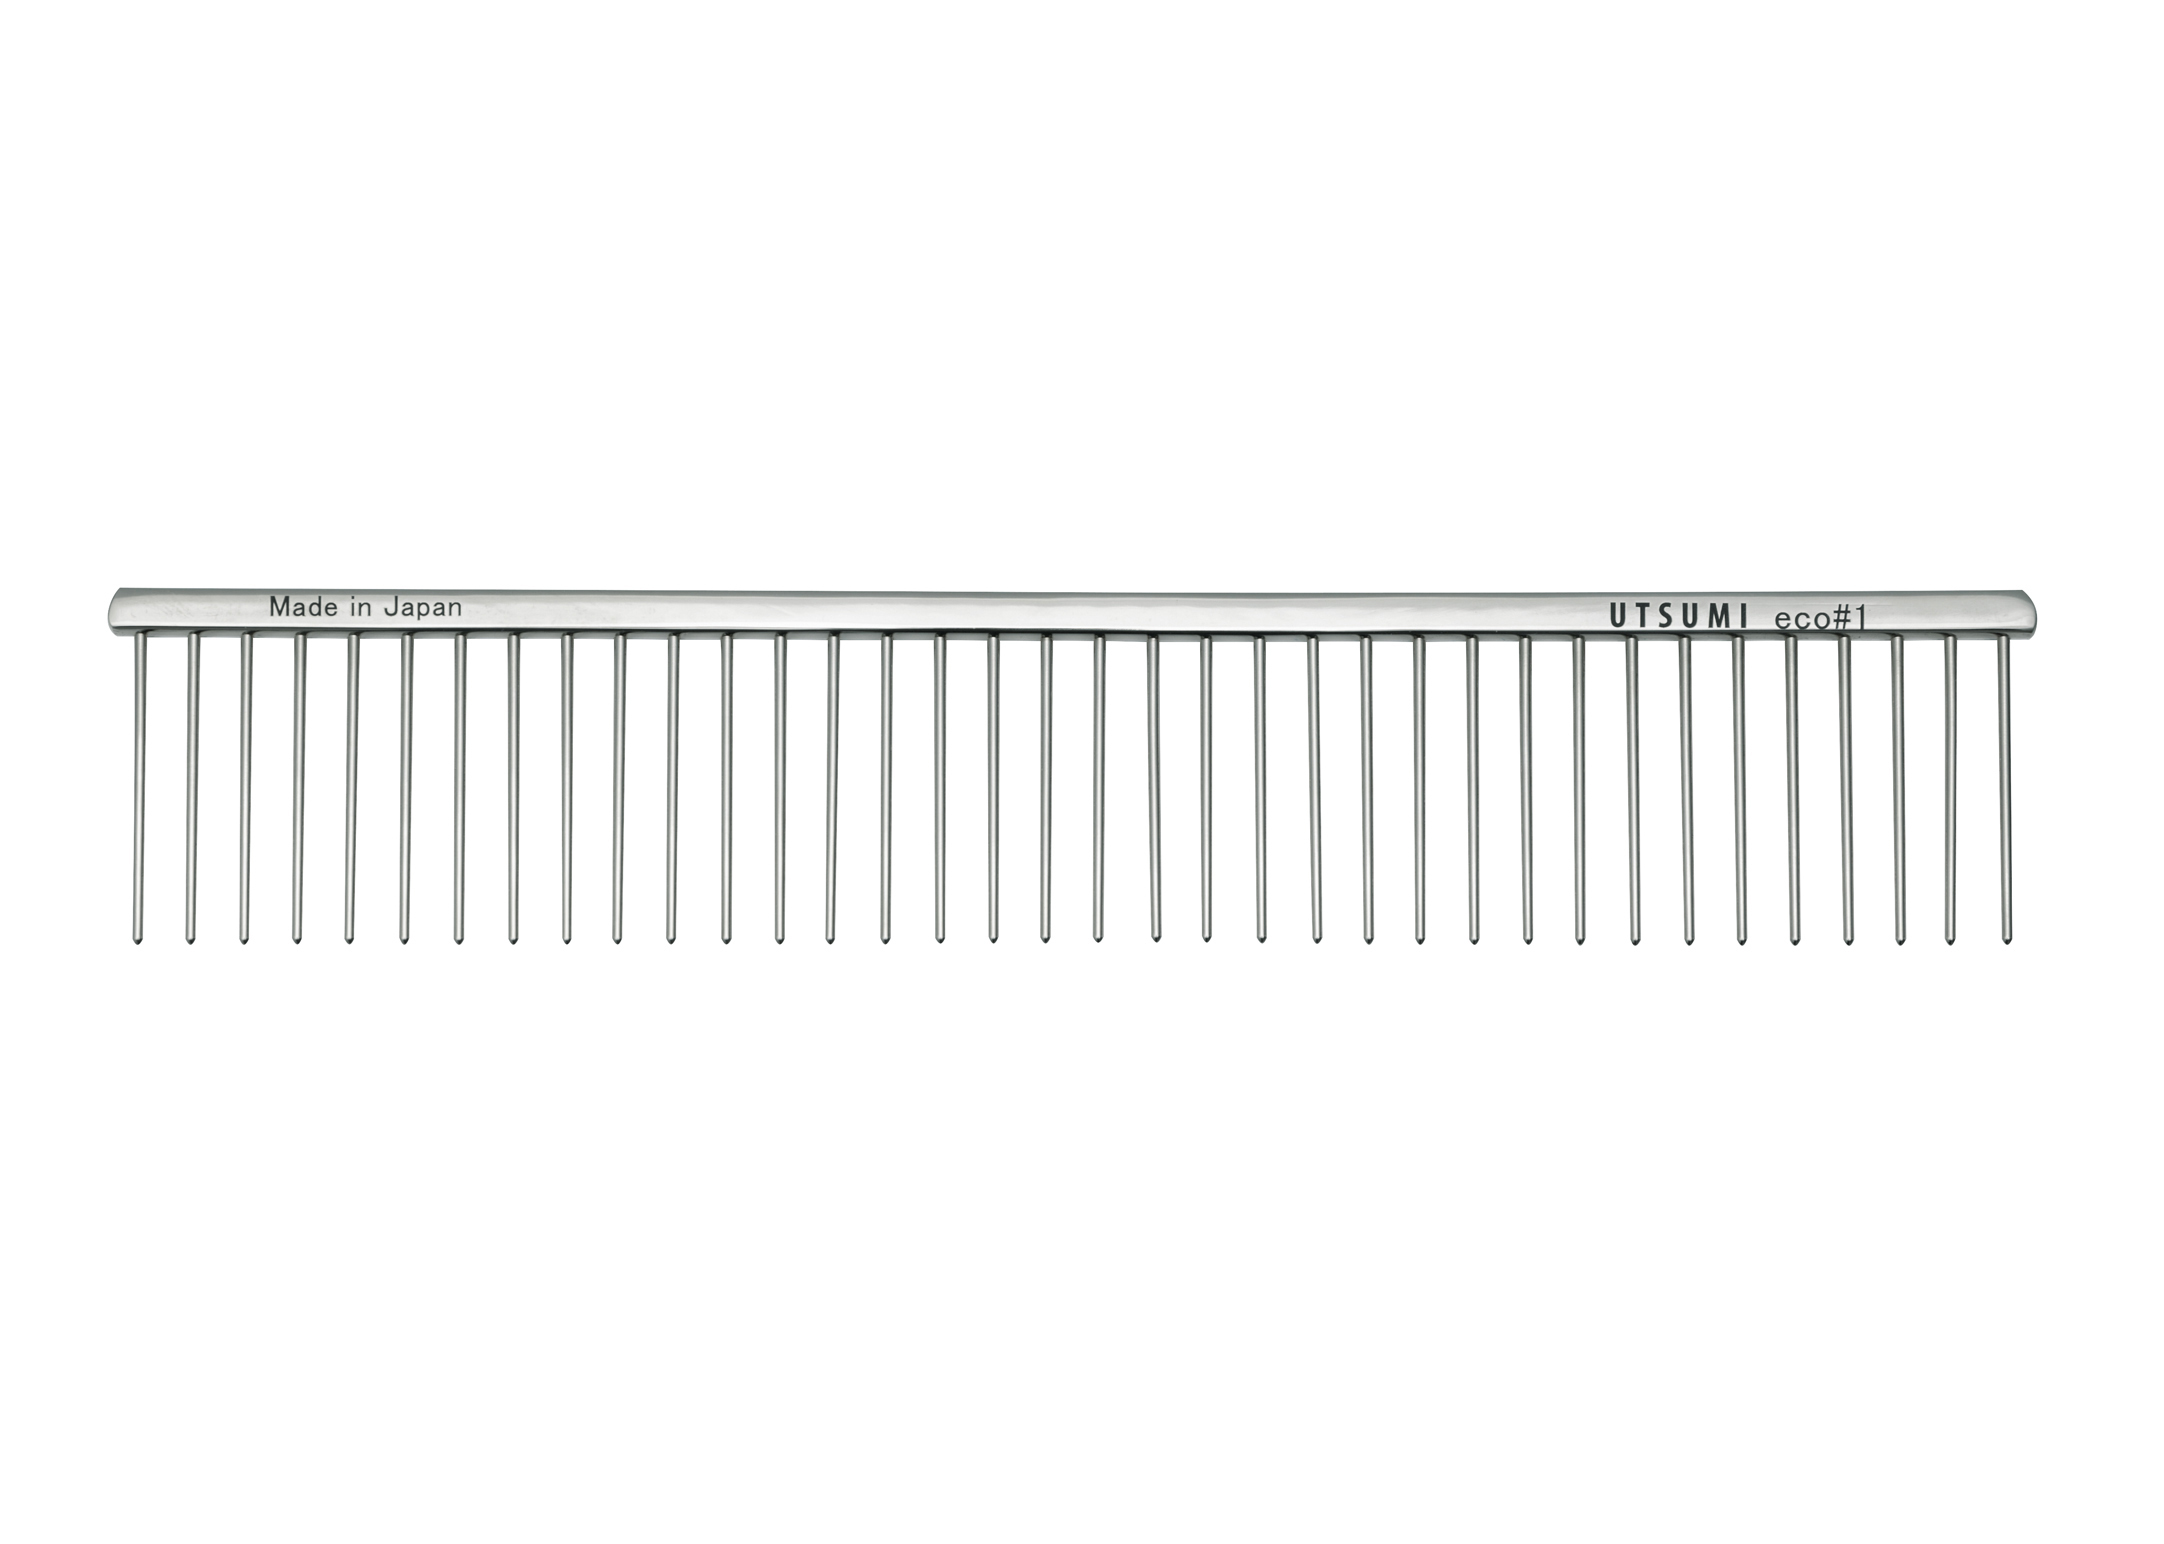 Utsumi Eco#1 Kam Zilver 25cm 4cm lange Tanden Kam